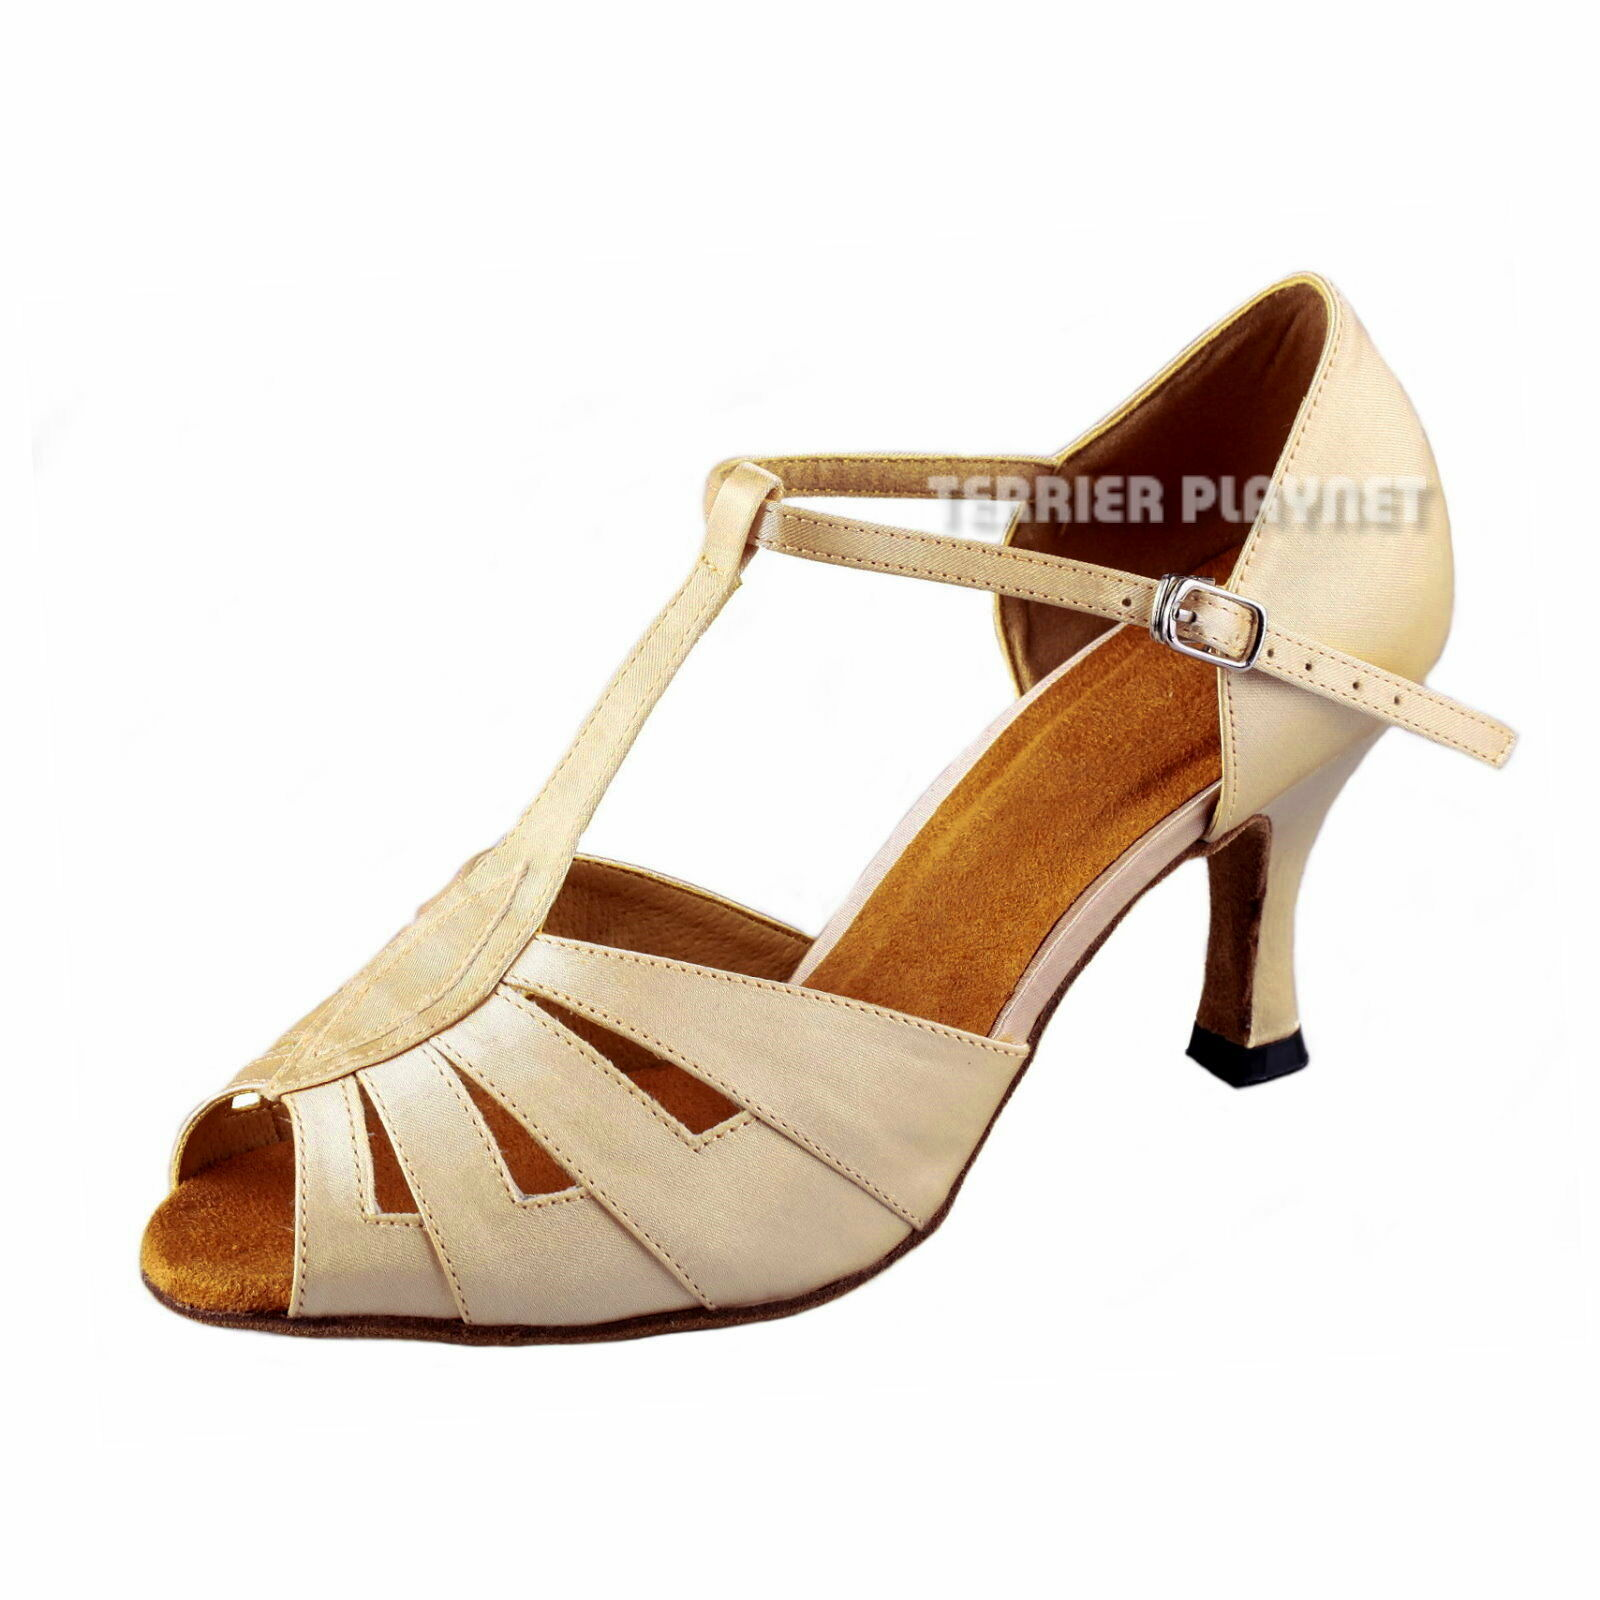 Vince Camuto Women's Sandal, Bavel Heeled Sandal, Women's Platinum, Size 6.5 d50480